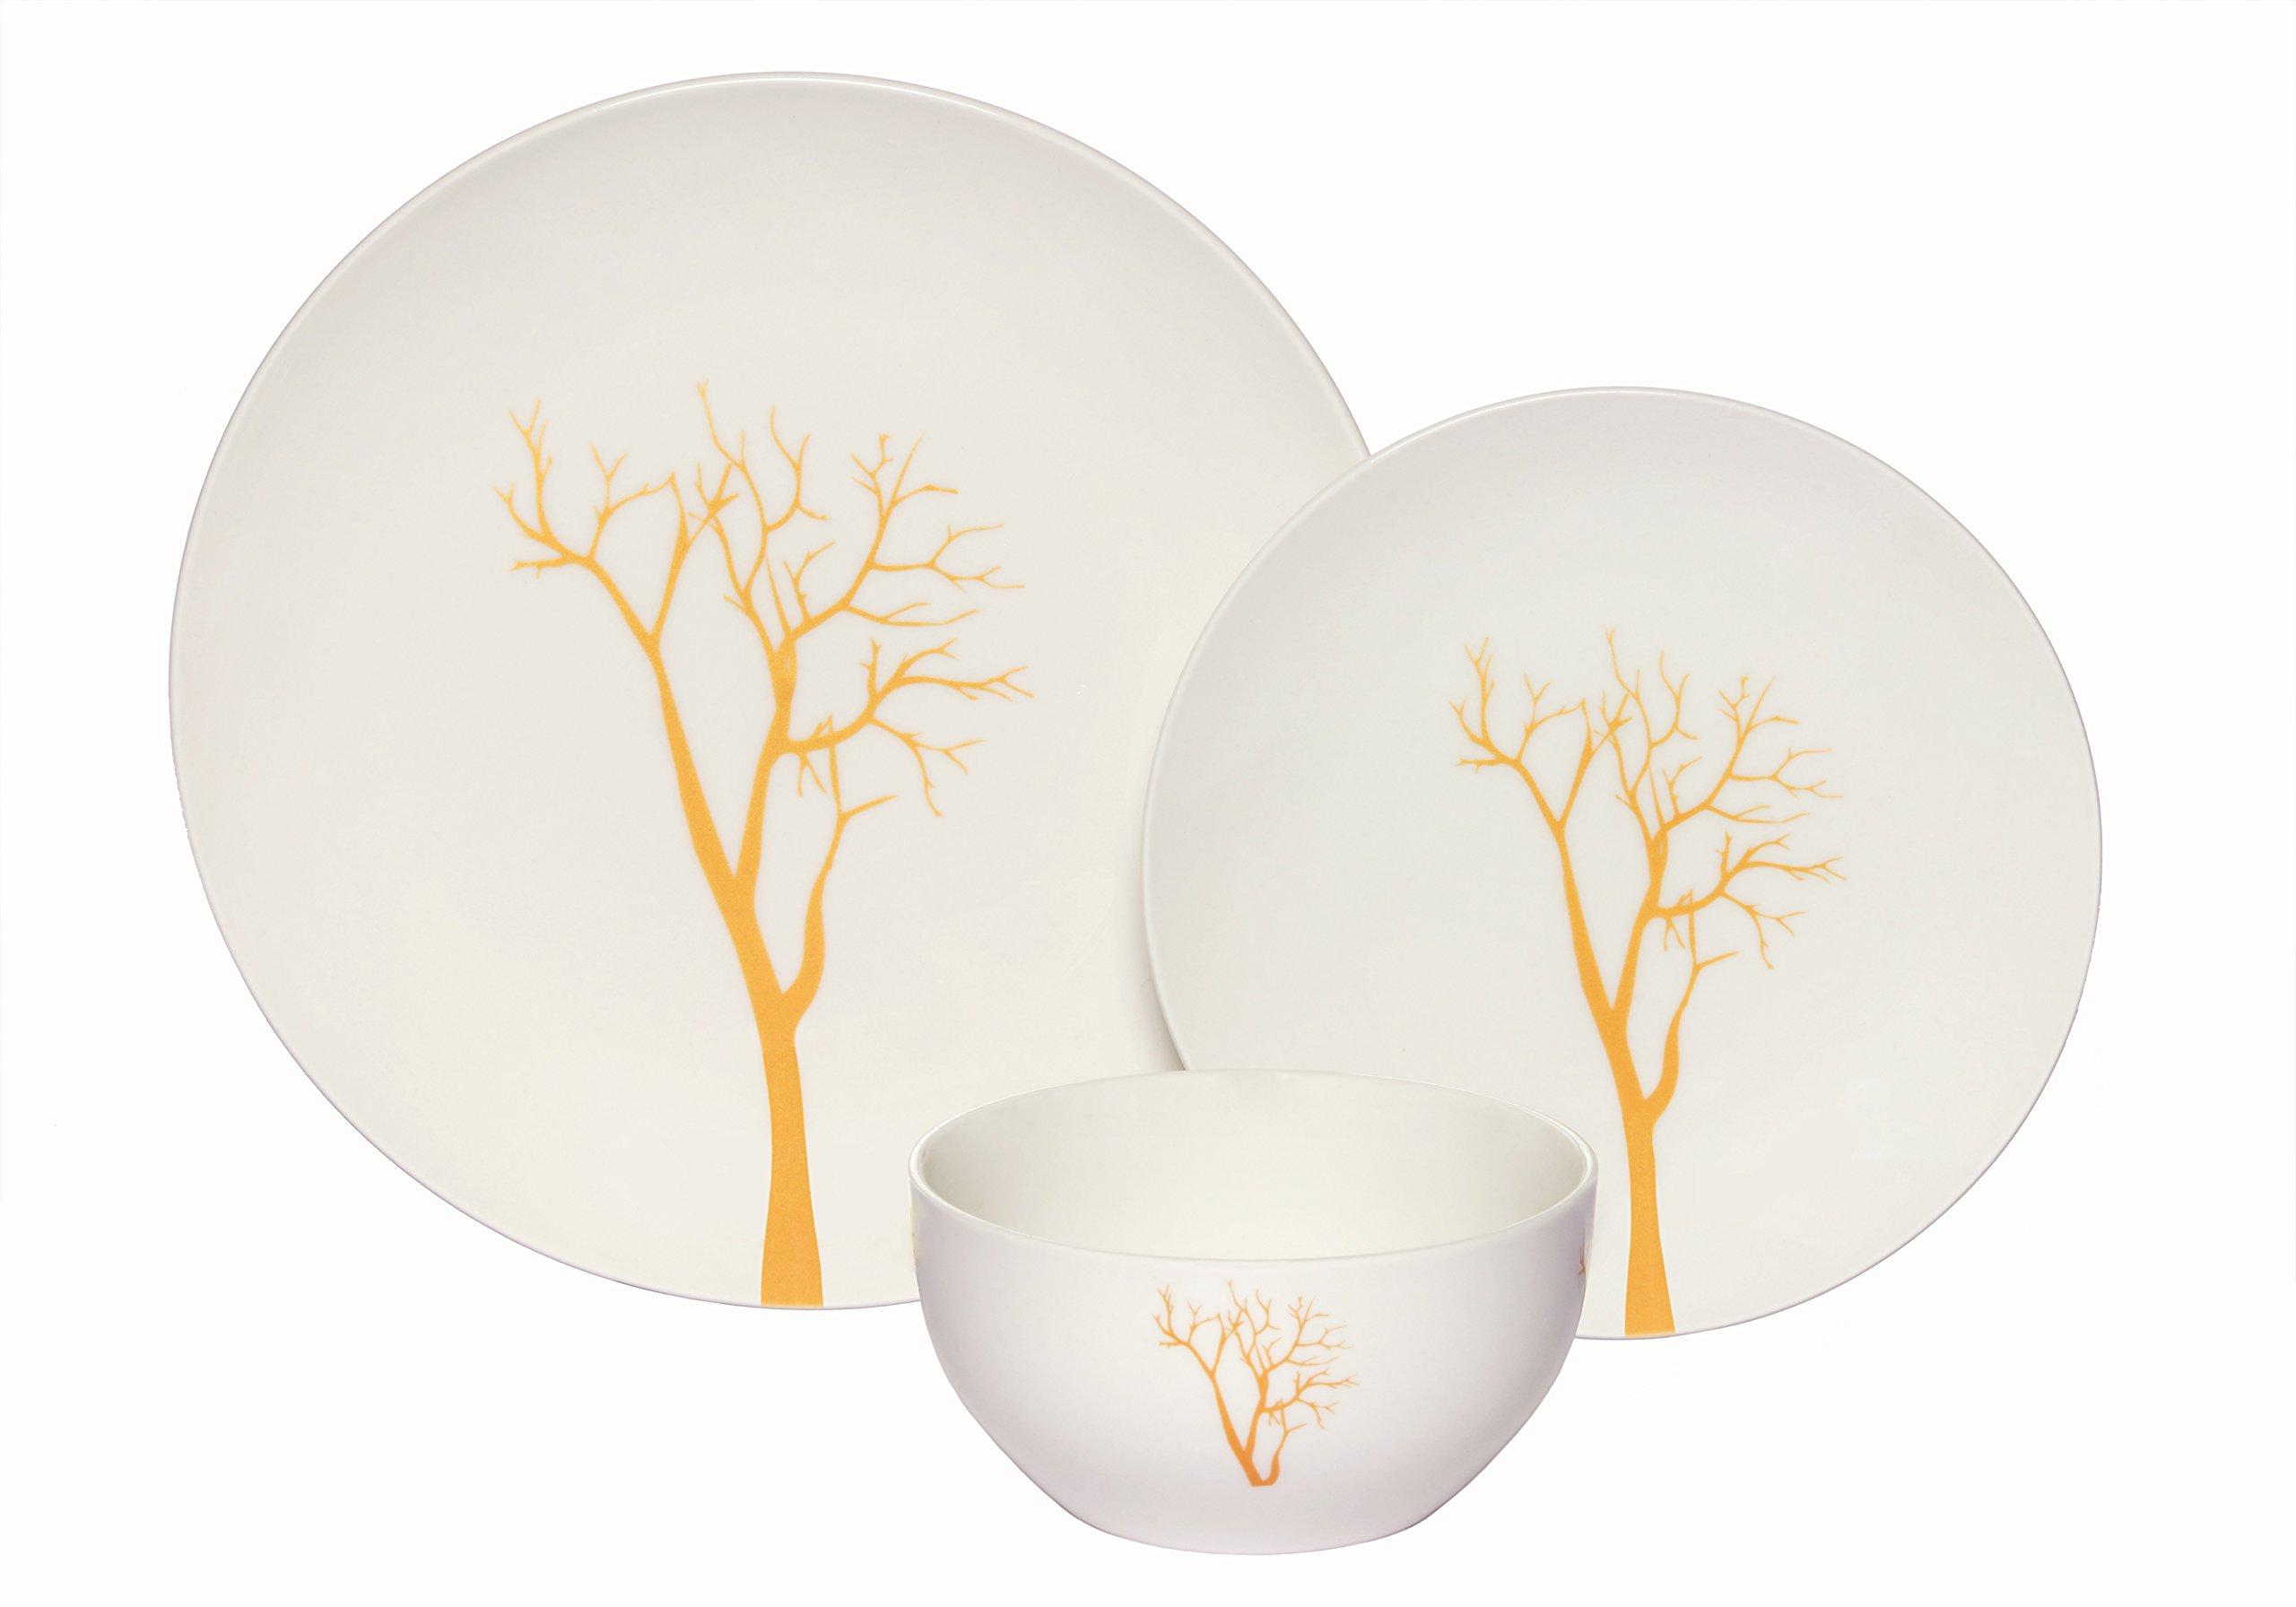 Melange Coupe 36-Piece Porcelain Dinnerware Set (Gold Tree) | Service for 12 | Microwave, Dishwasher & Oven Safe | Dinner Plate, Salad Plate & Soup Bowl (12 Each)